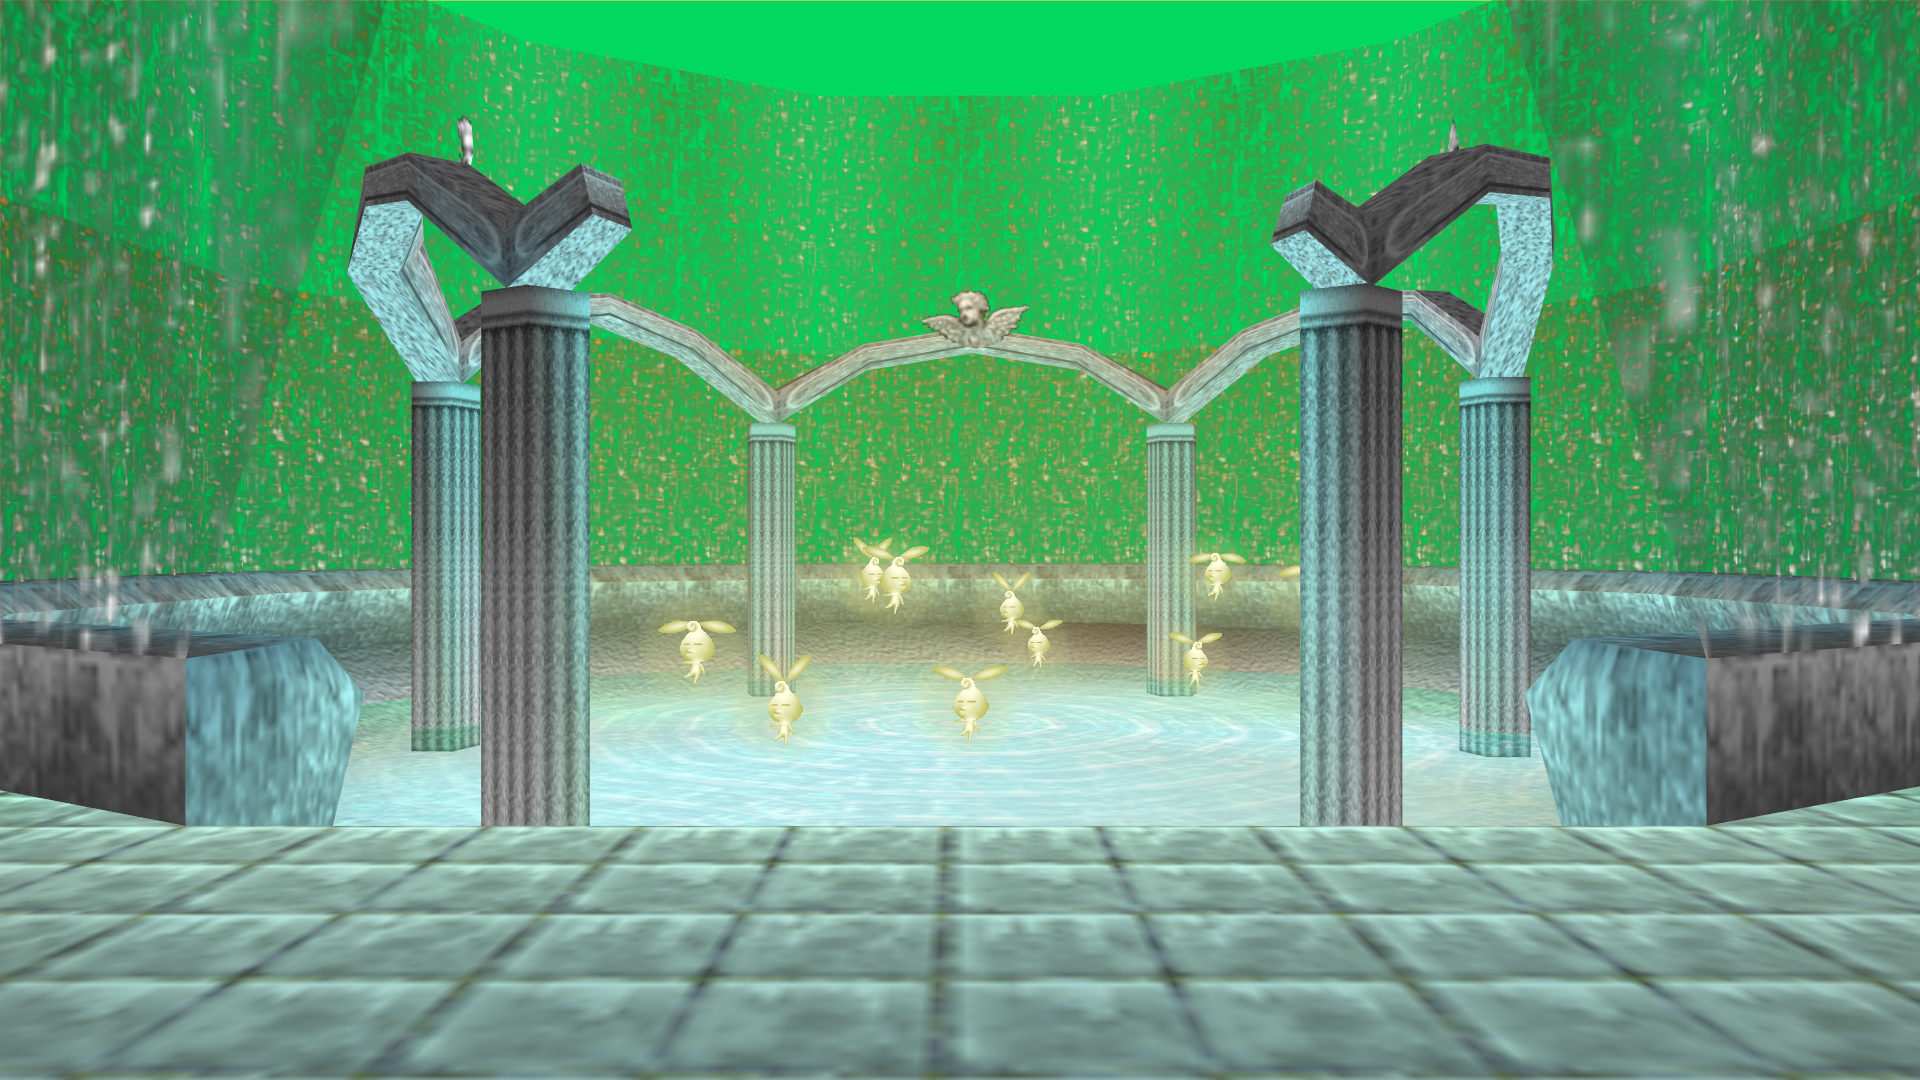 Great Fairy Fountain Zeldapedia Fandom Powered By Wikia